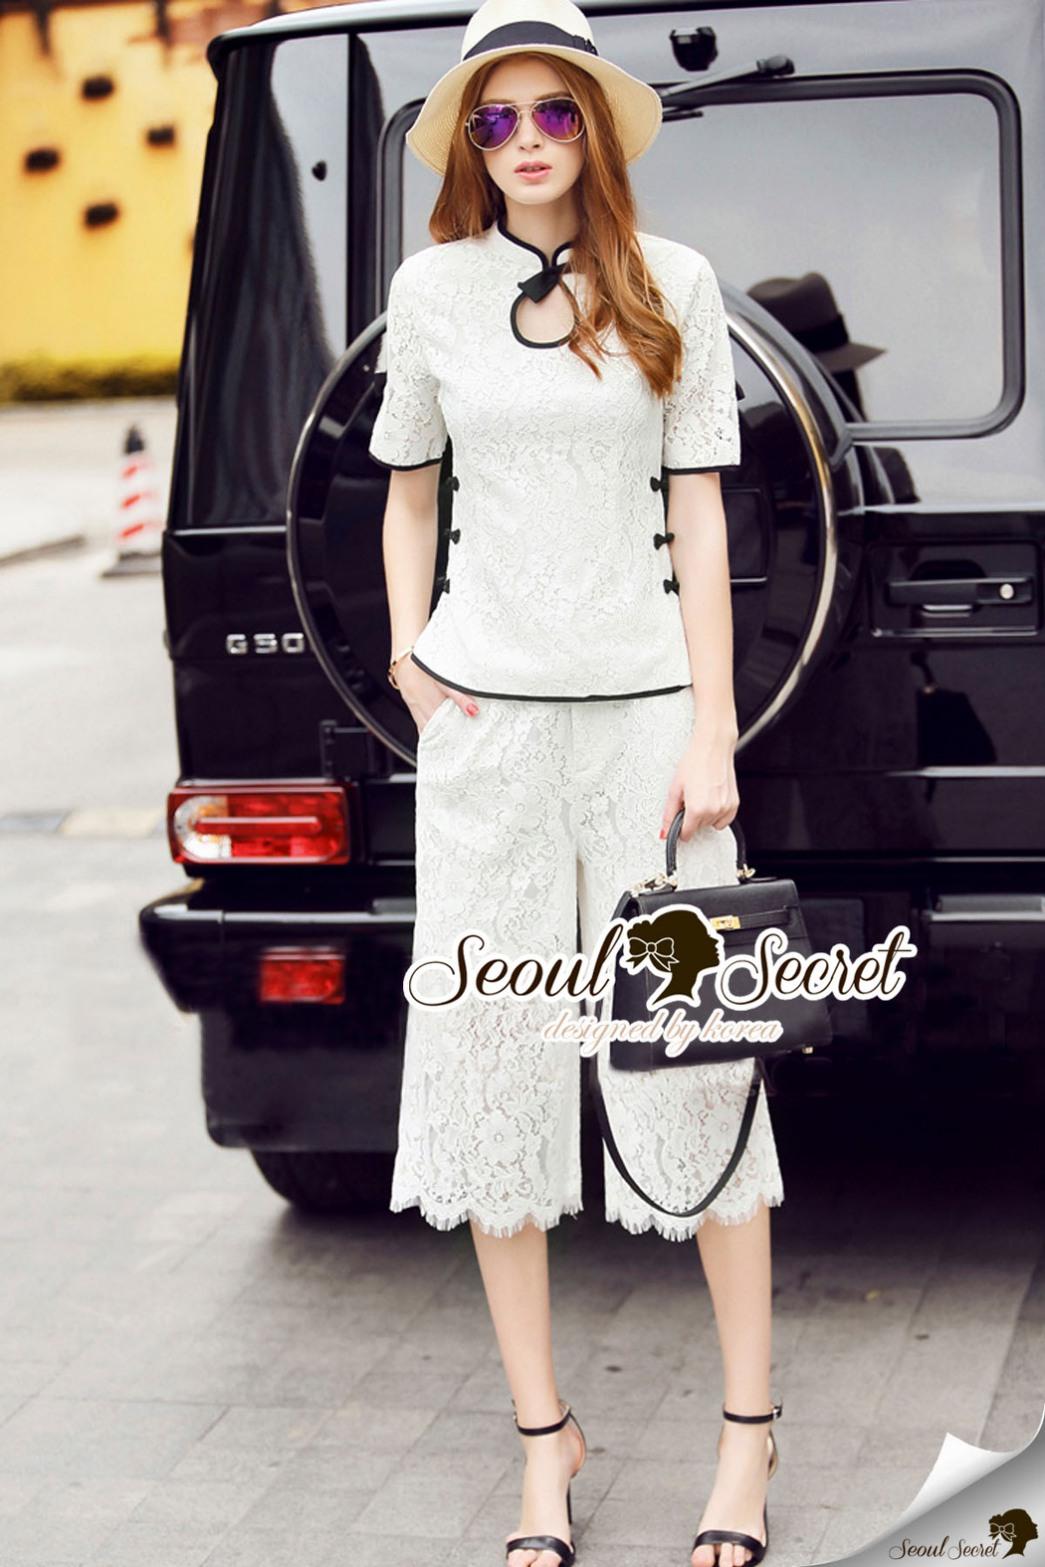 Seoul Secret Say's... Lollita Bowy Princess Lace Set